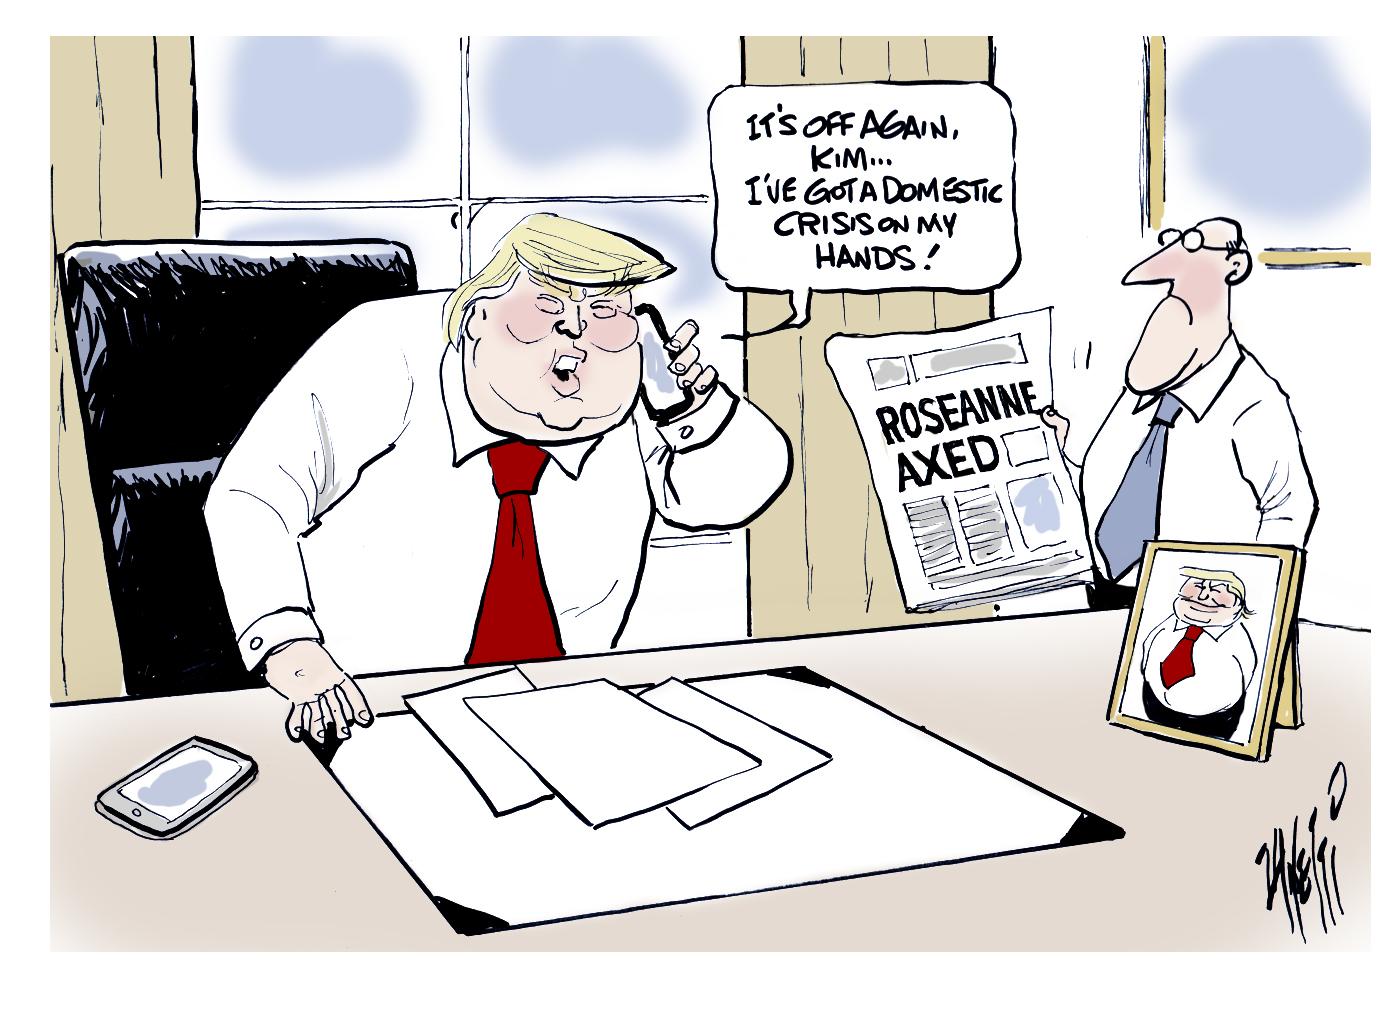 Donald Trump Rosanne axing